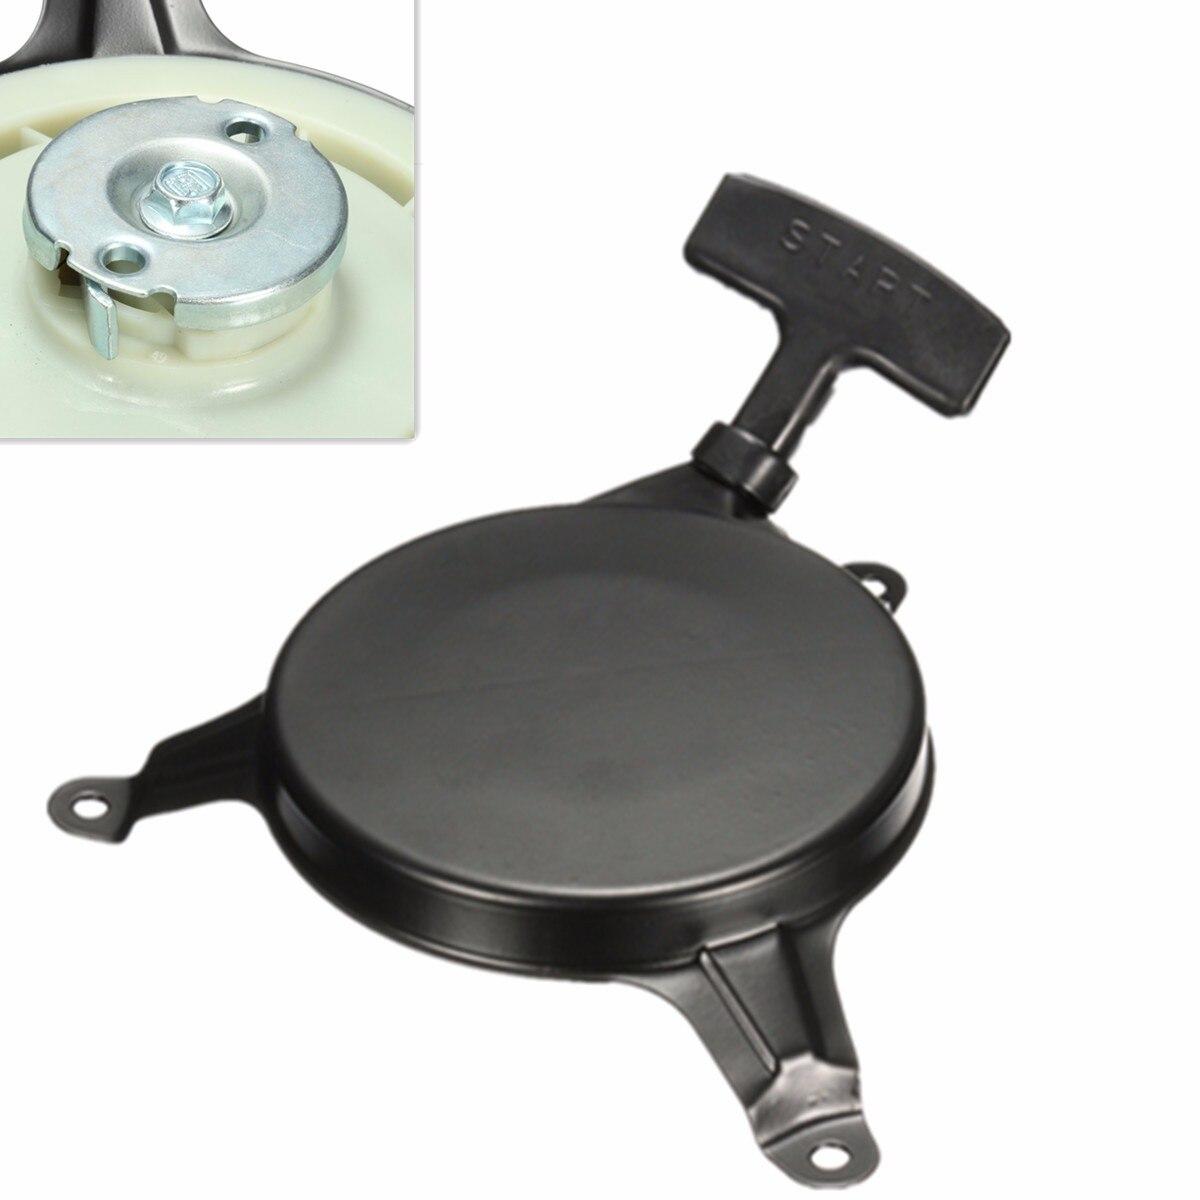 Recoil Starter Start Assembly For MTD Engine Push Mower 751-10299 951-10299A